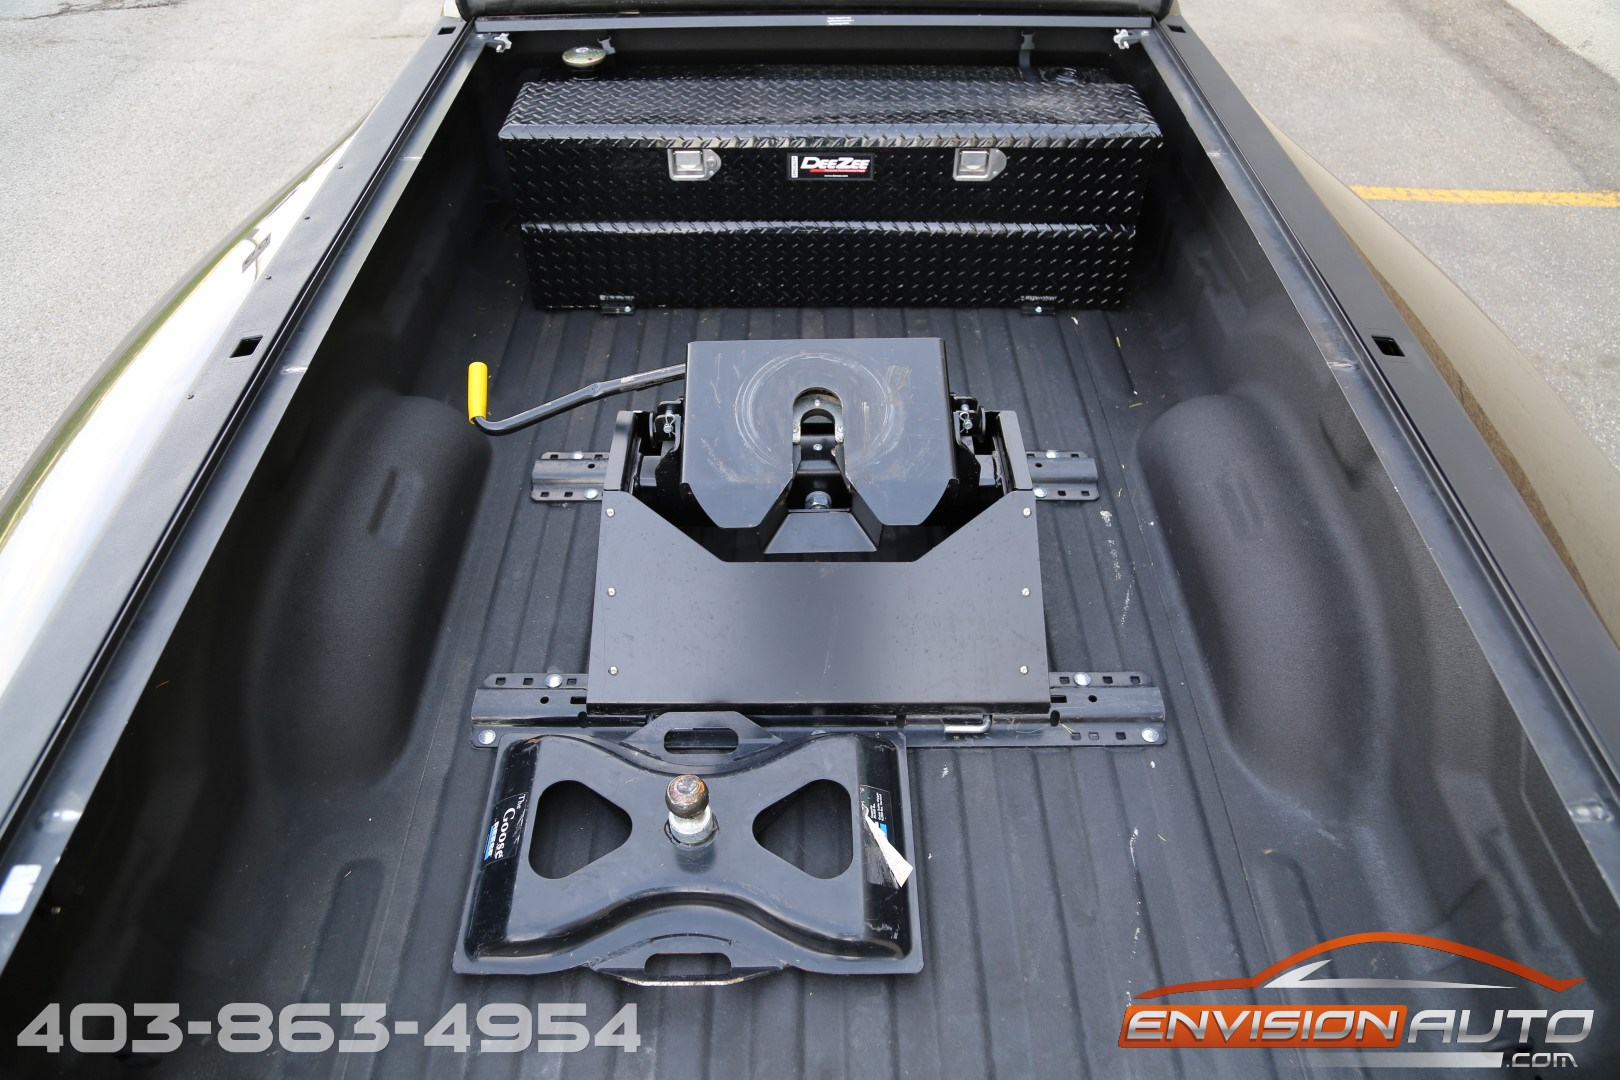 2012 Dodge RAM 3500 Longhorn Crew Dually 4×4 – Fifth Wheel – Aux Fuel Tank - Envision Auto